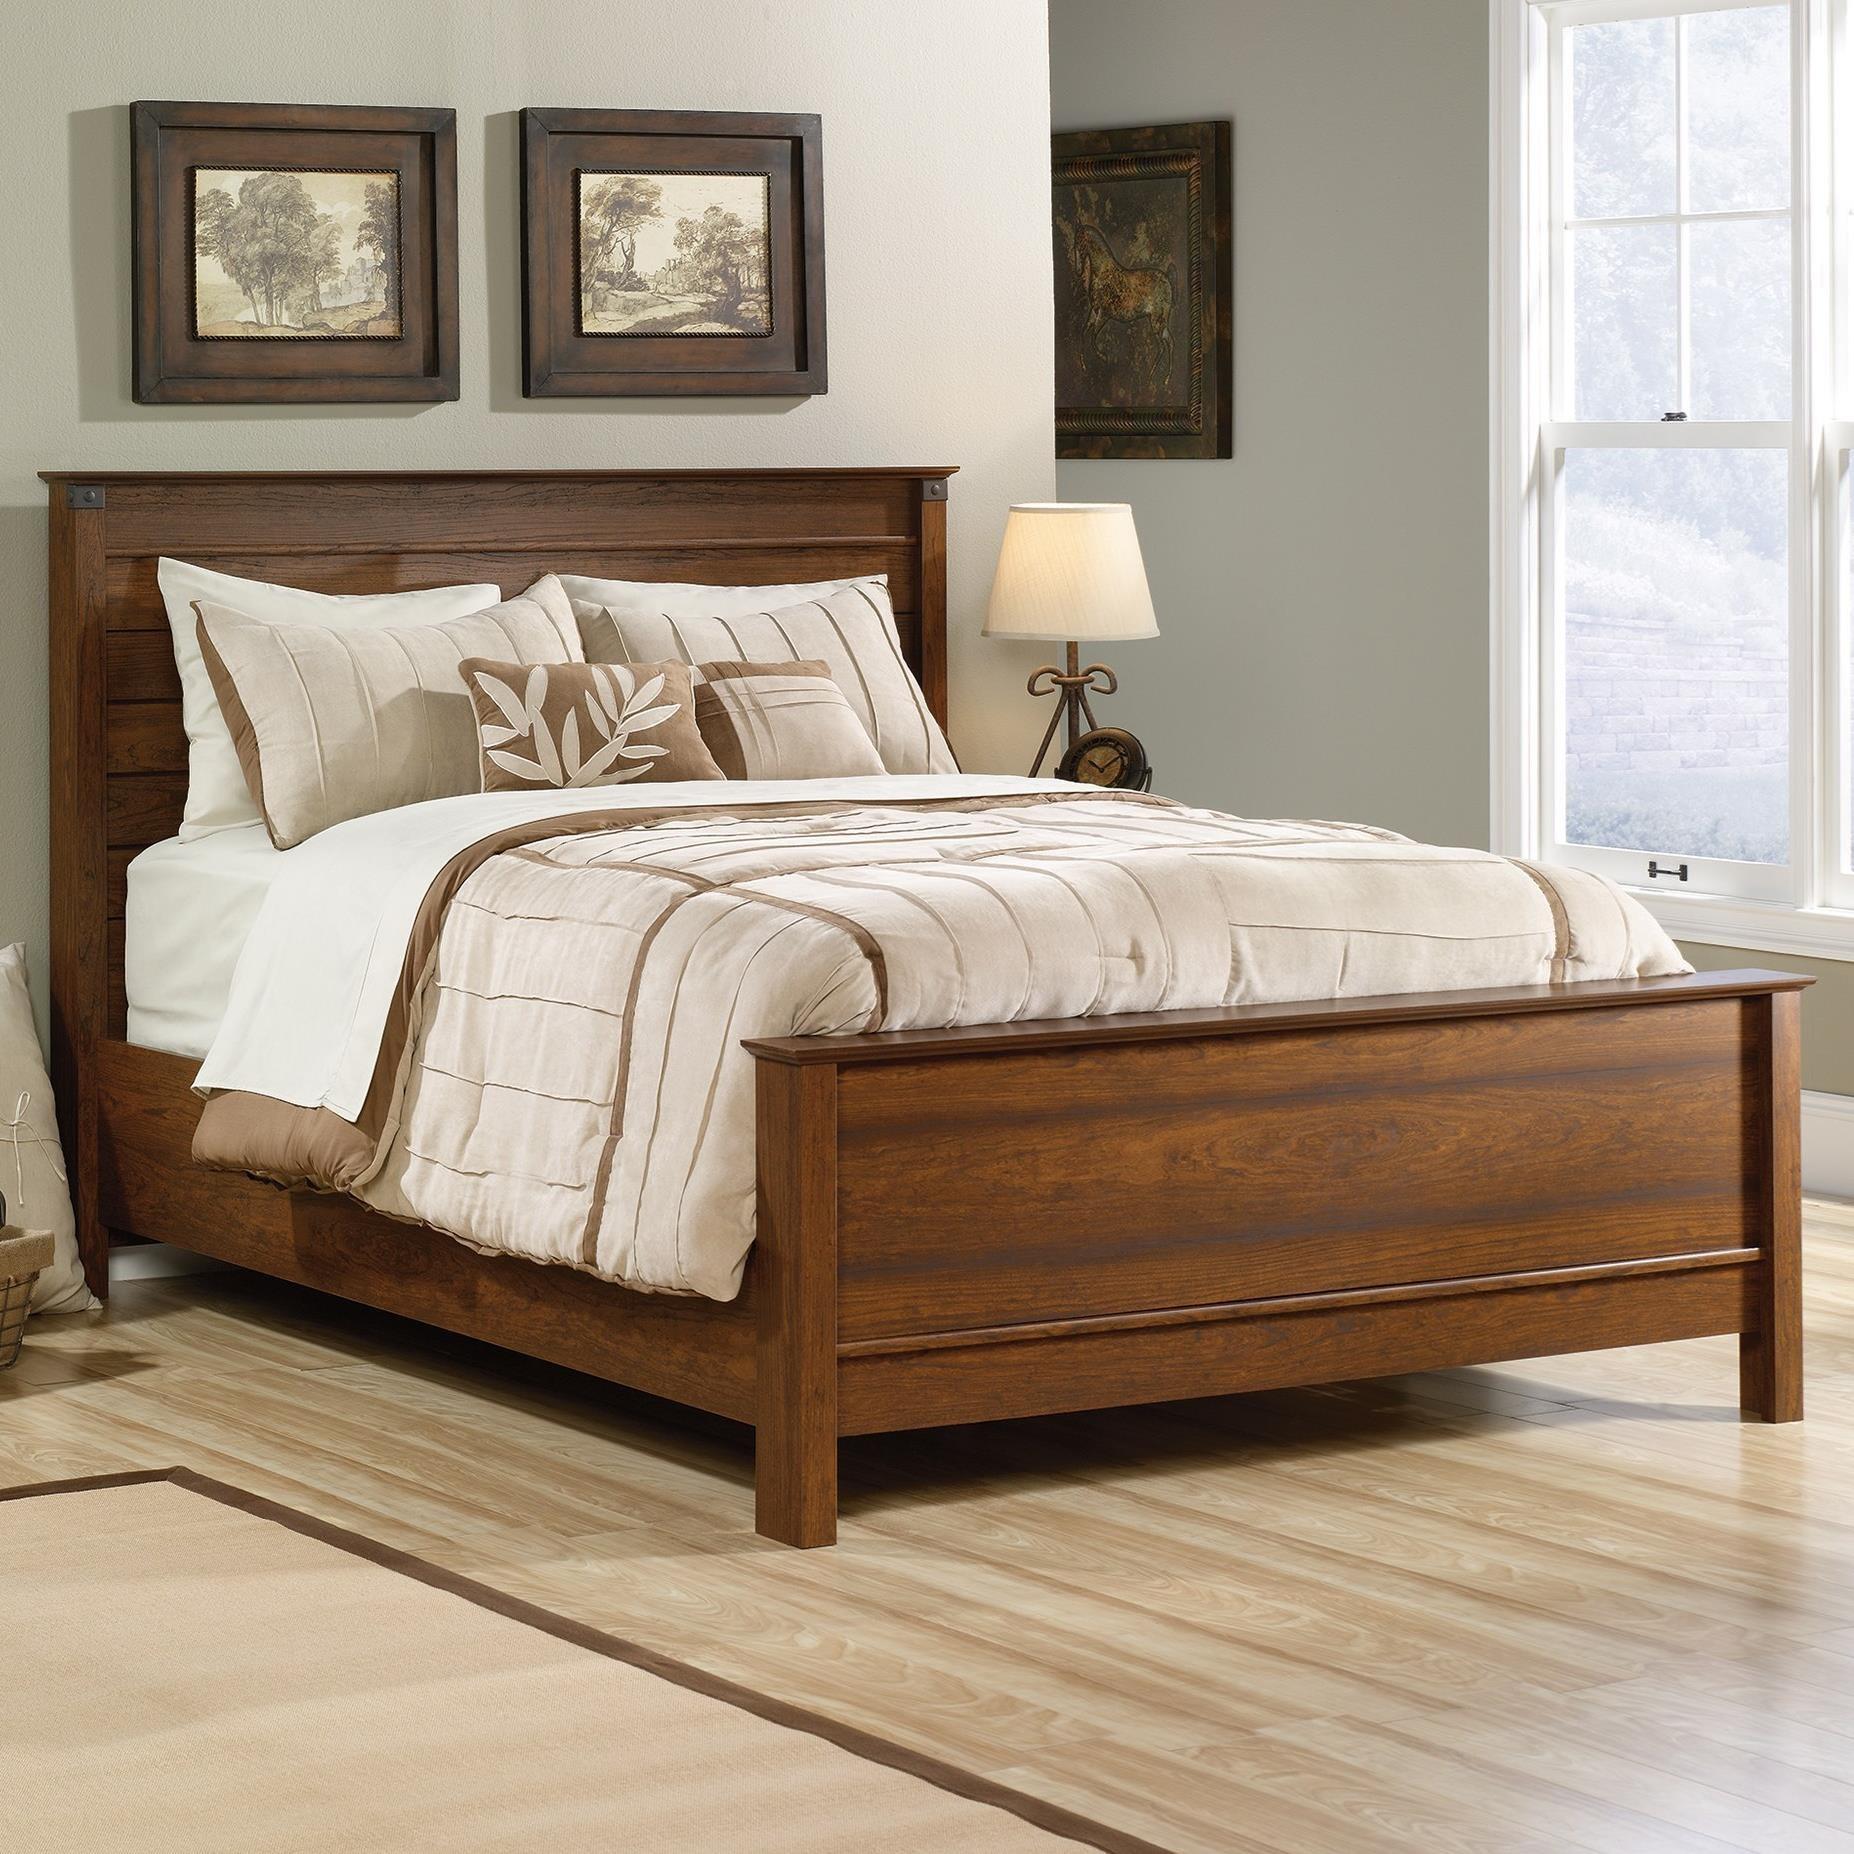 Sauder Carson Forge Queen Bed John V Schultz Furniture Panel Beds